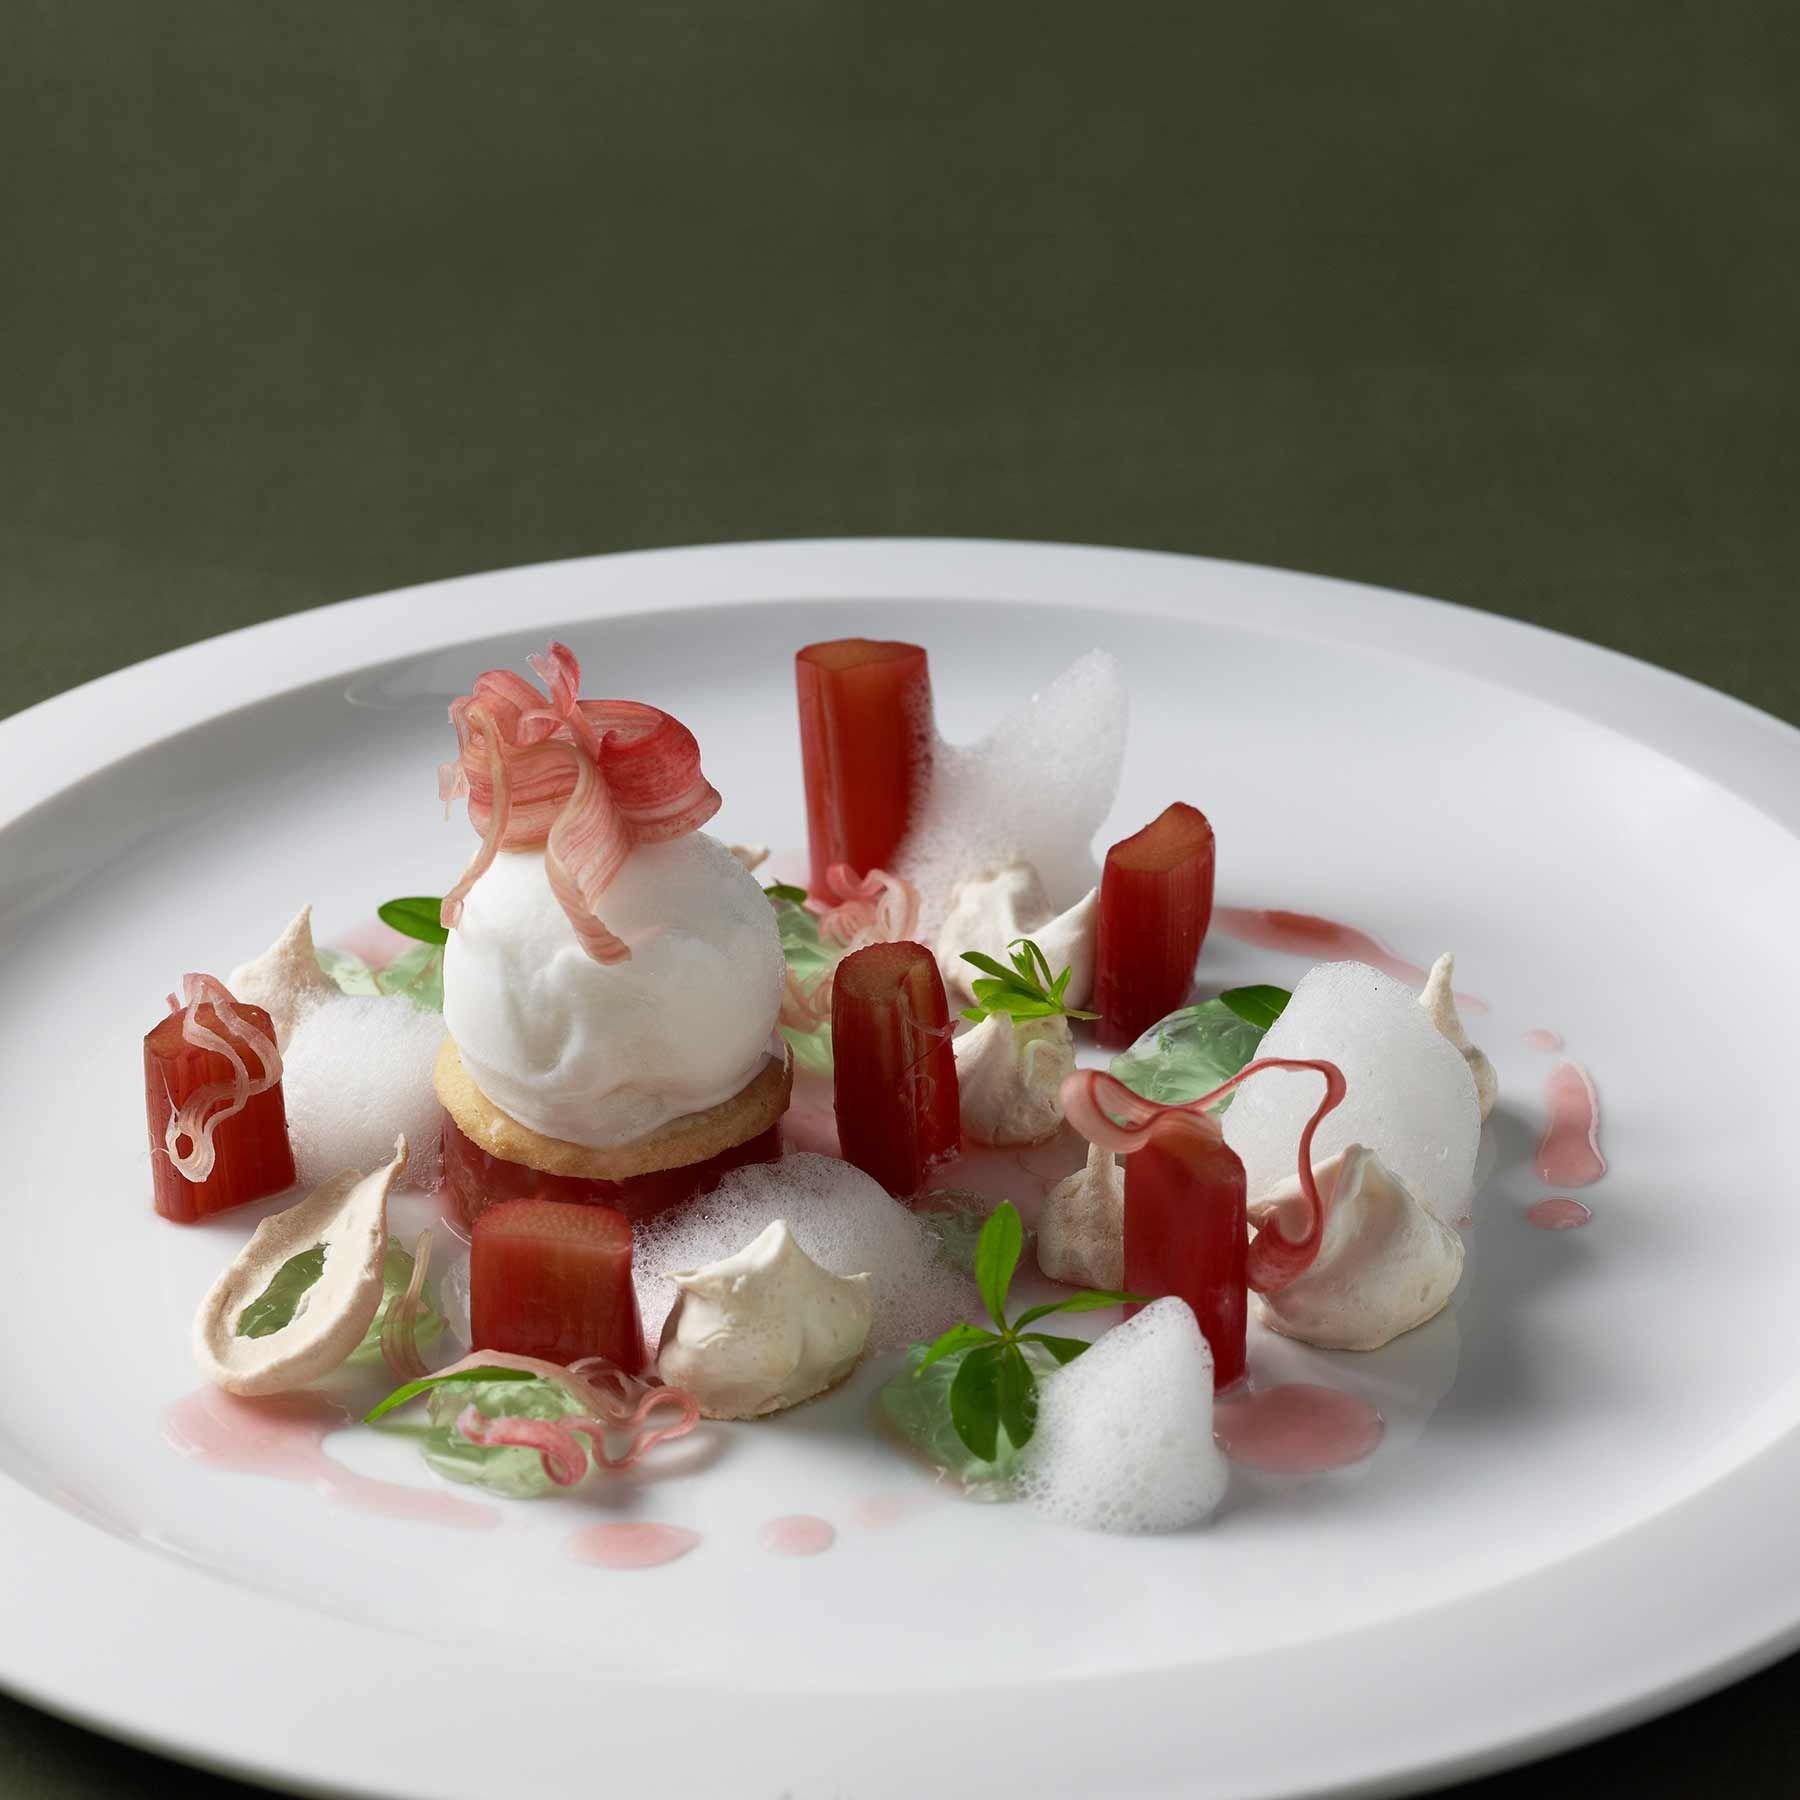 Johannes King Rezept Rhabarber Gourmet Desserts Einfacher Nachtisch